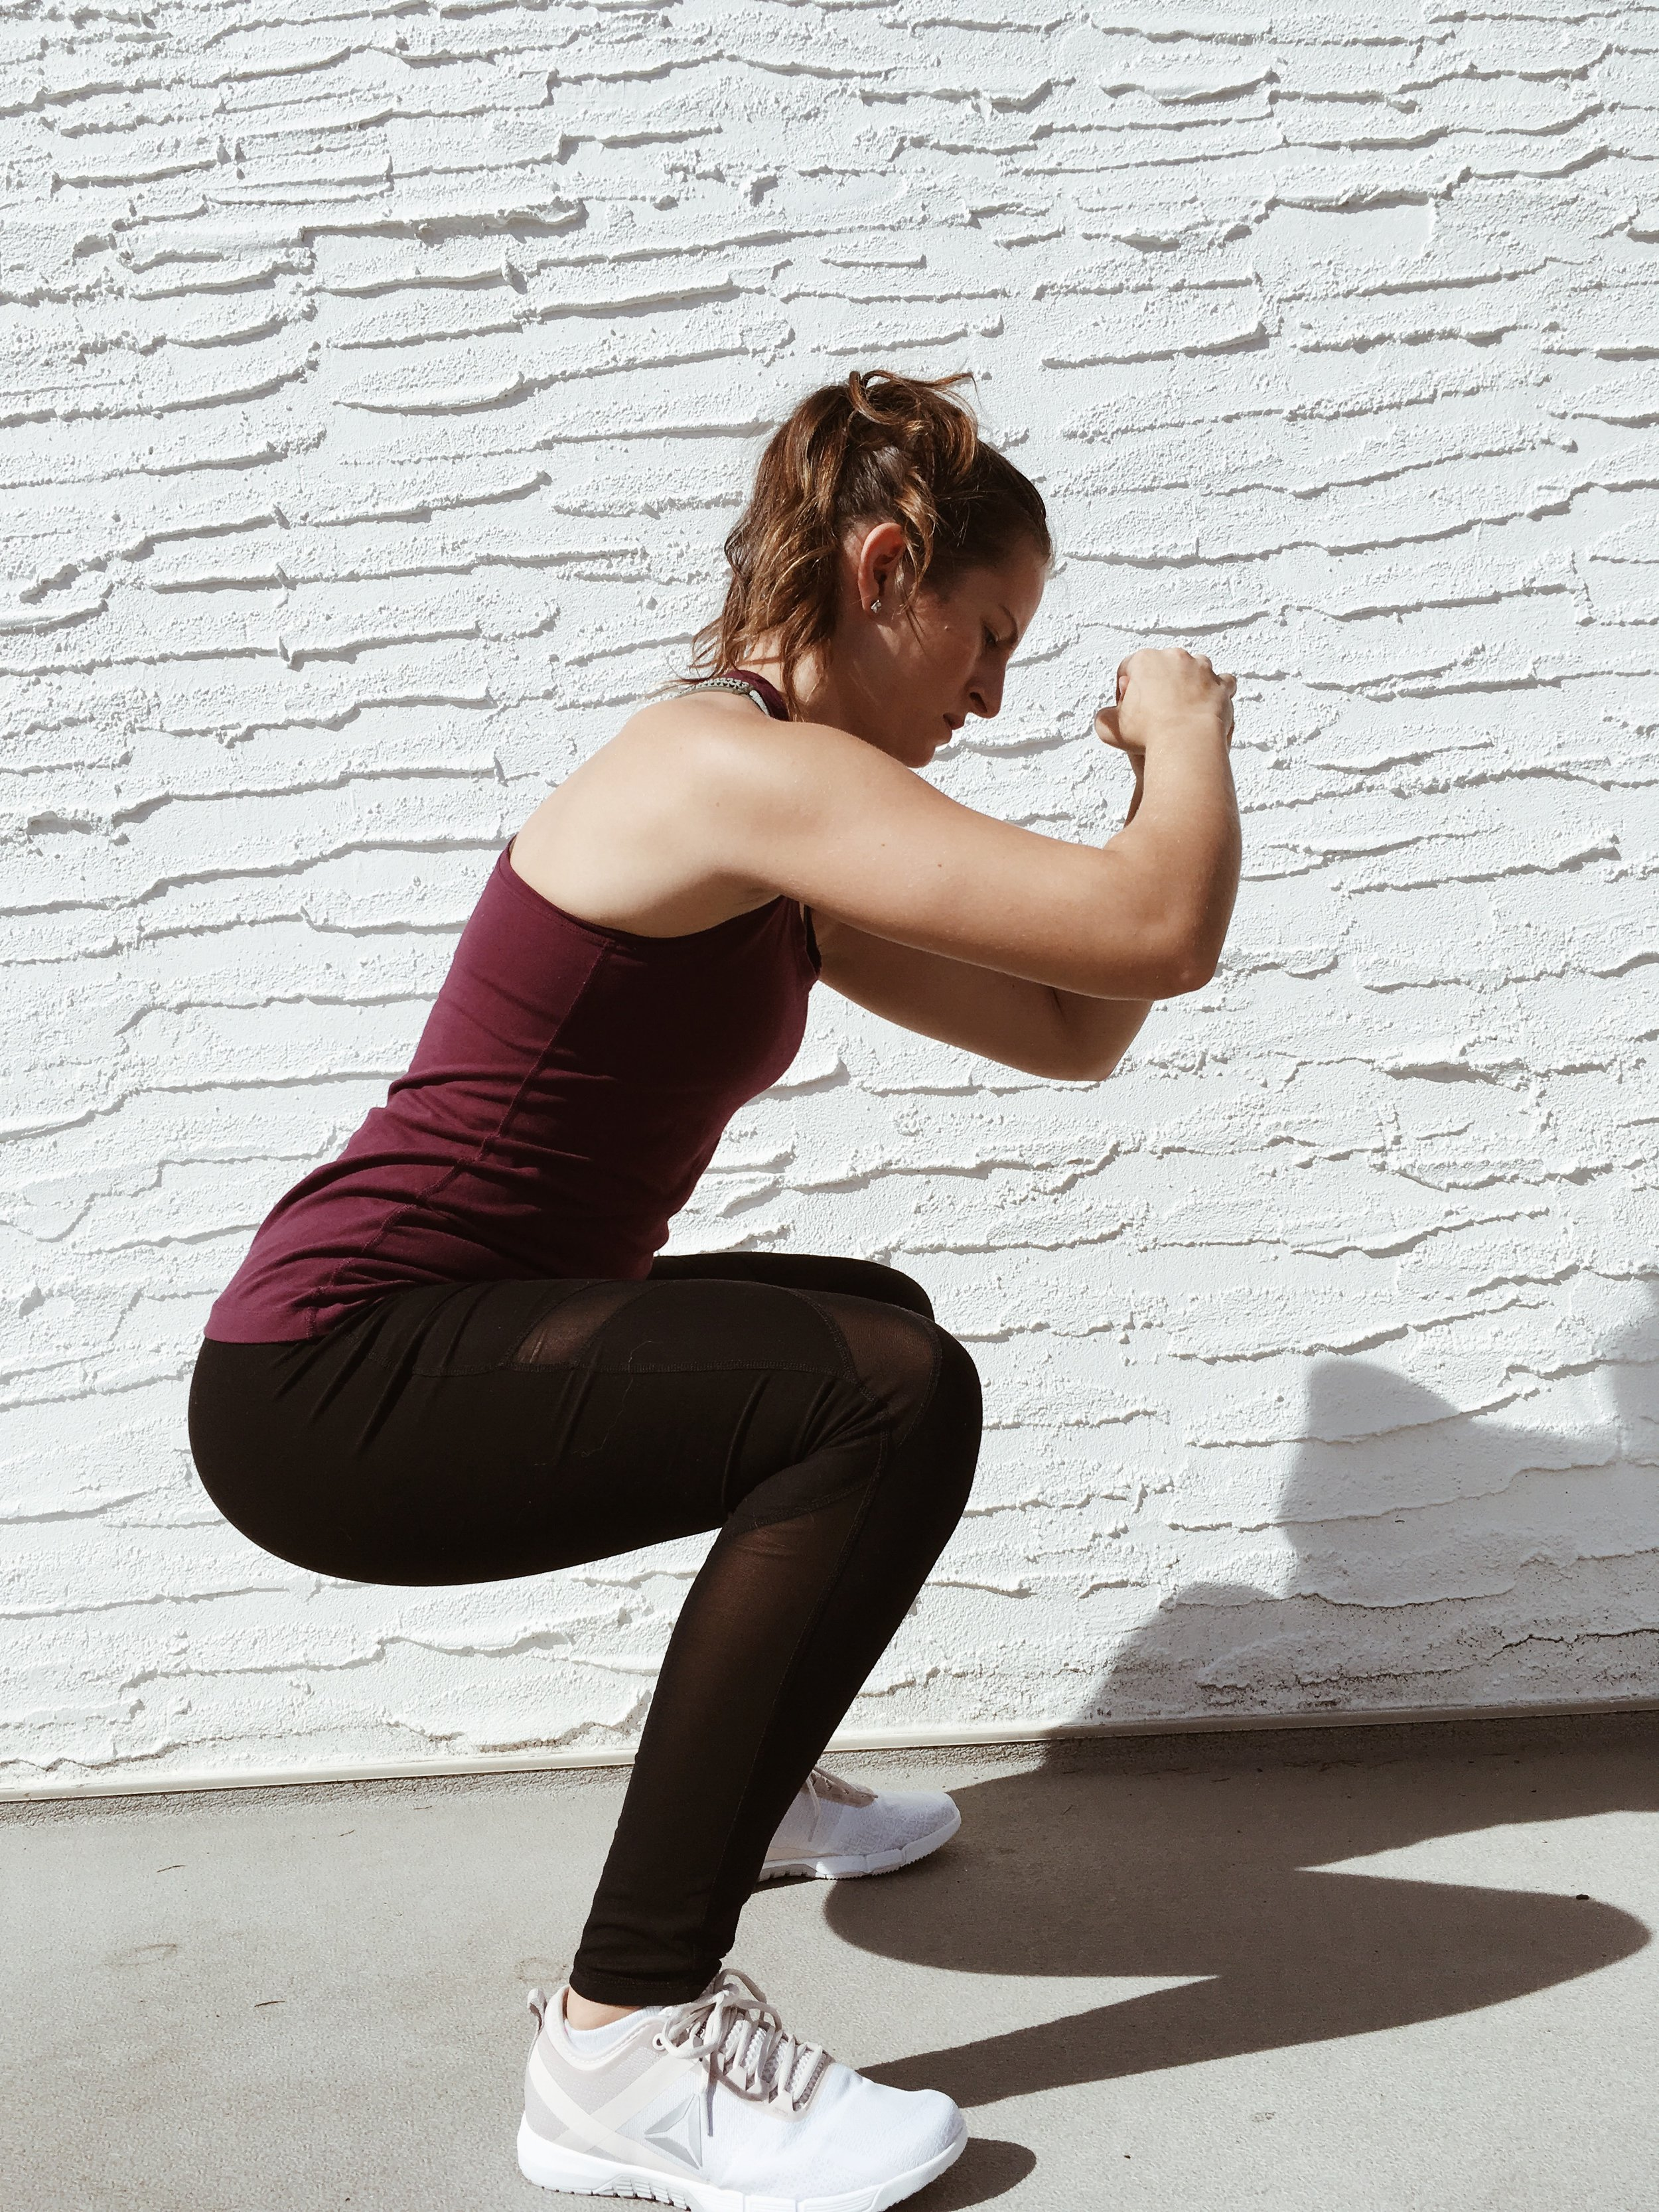 Post-partum workout plan